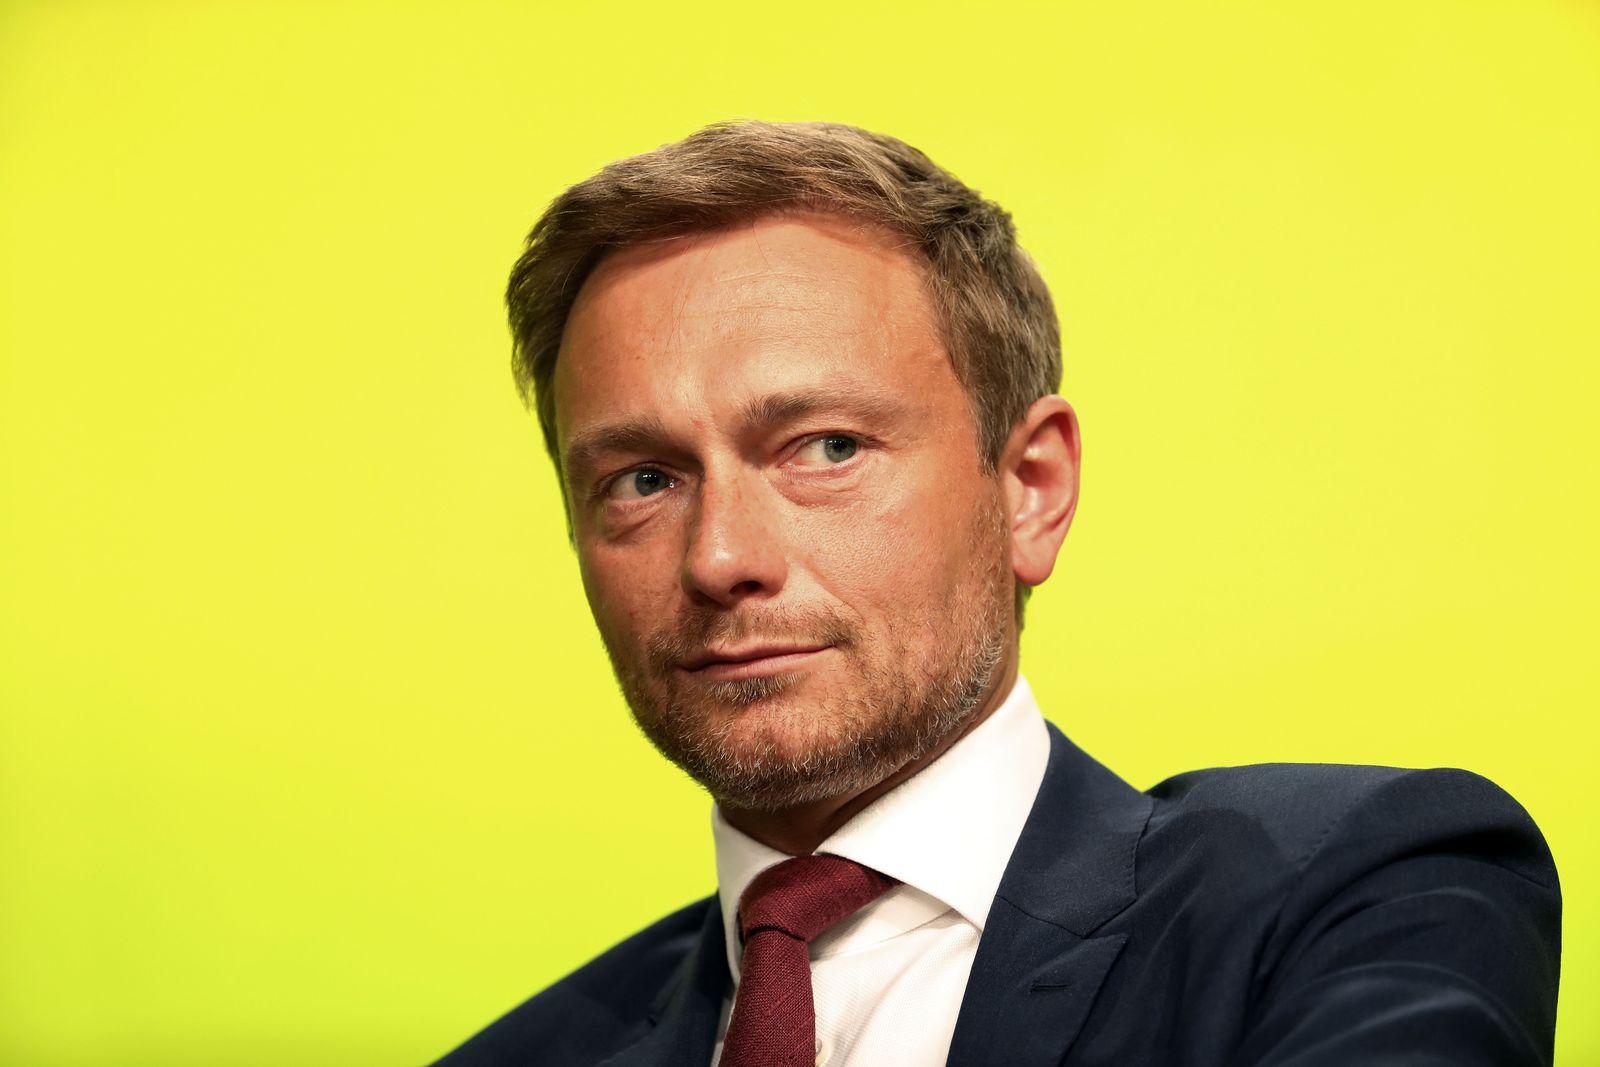 NRW Wahl / Christian Lindner